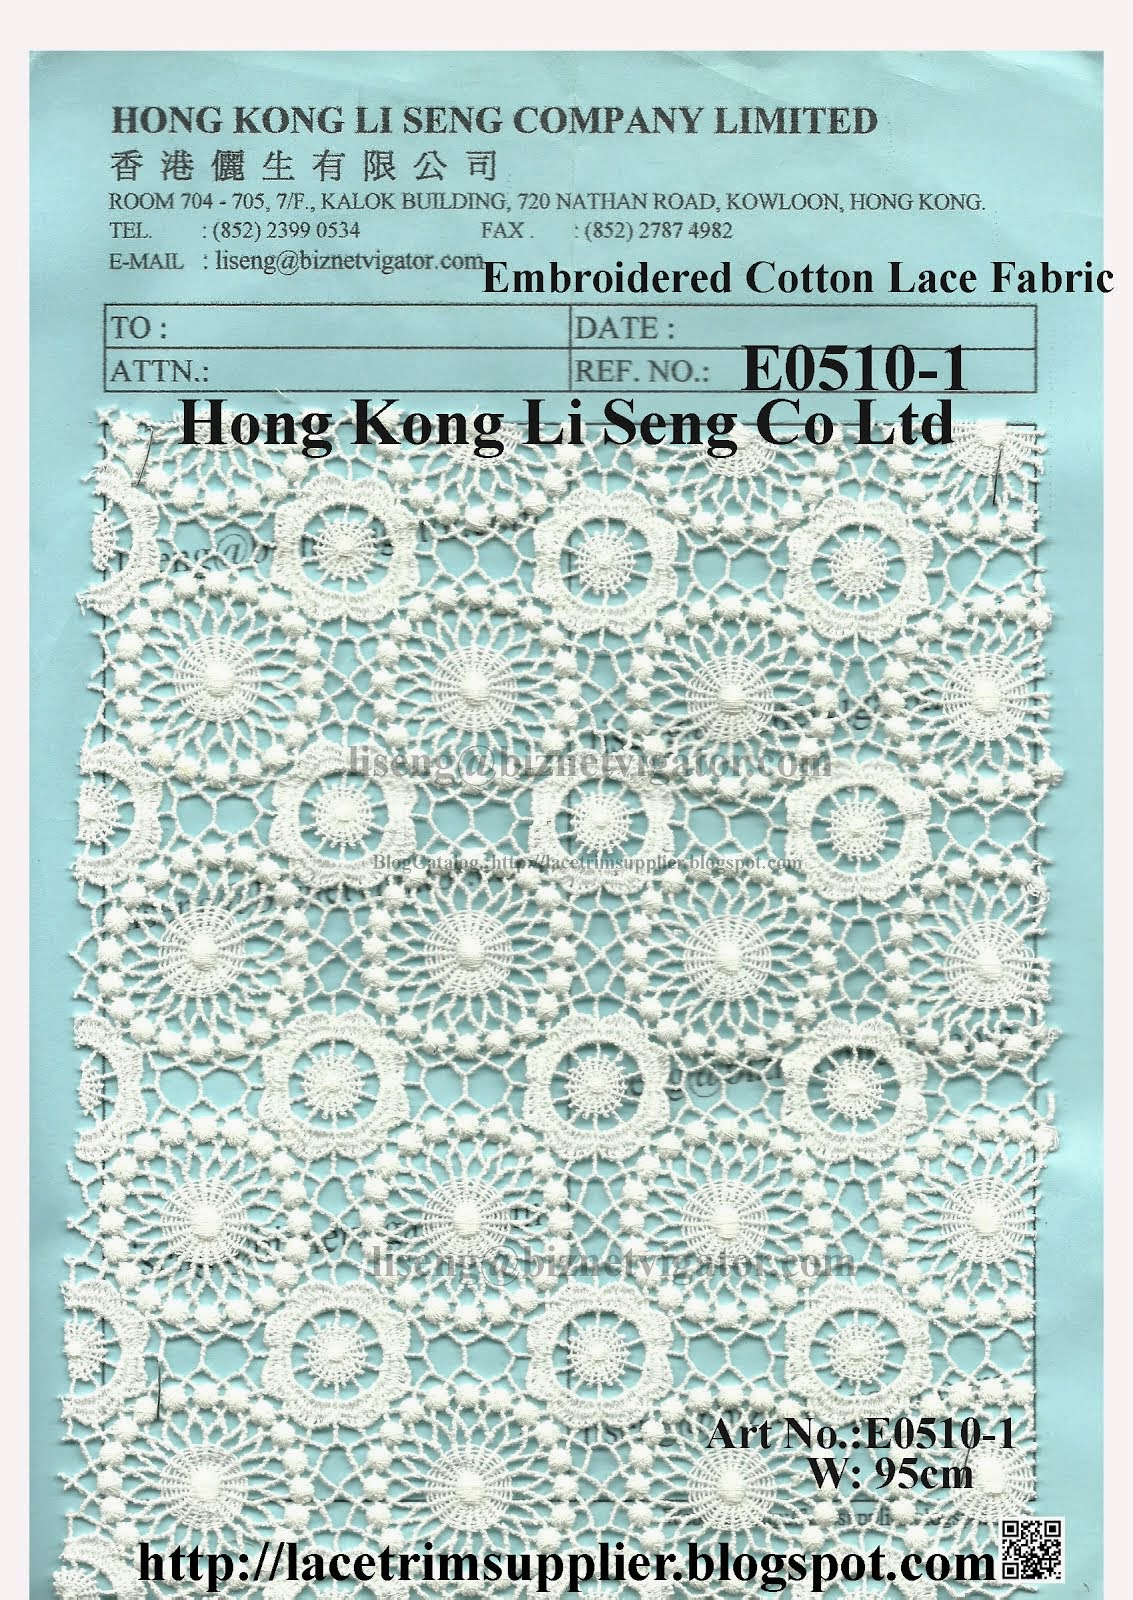 2014 New Lace Fabric Pattern Shown On - Hong Kong Li Seng Co Ltd